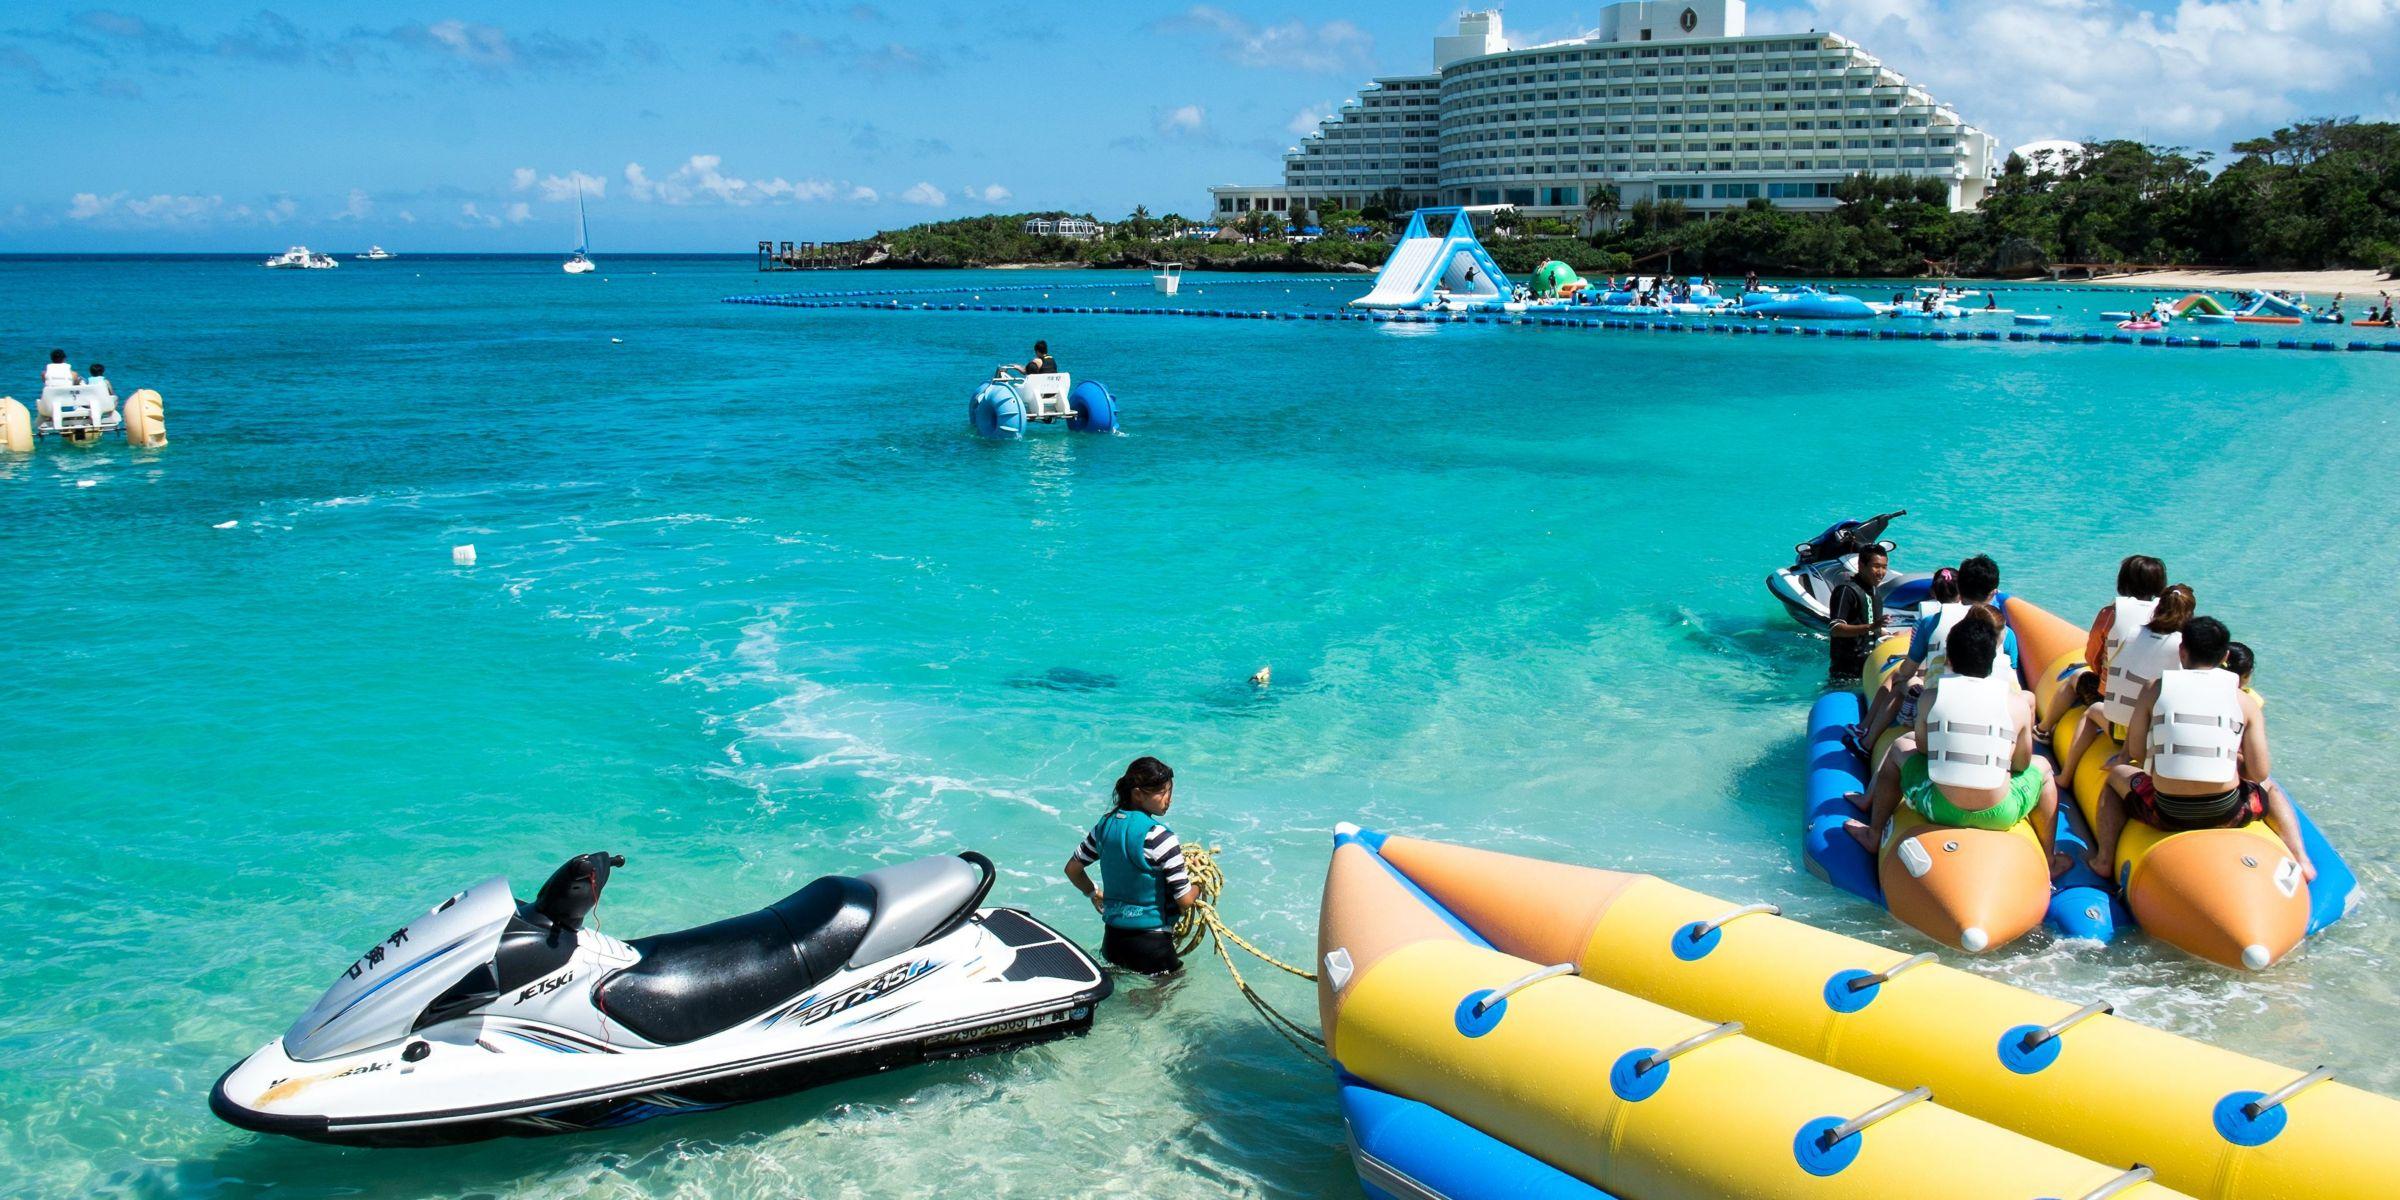 Okinawa Hotels Intercontinental Ana Manza Beach Resort Hotel In